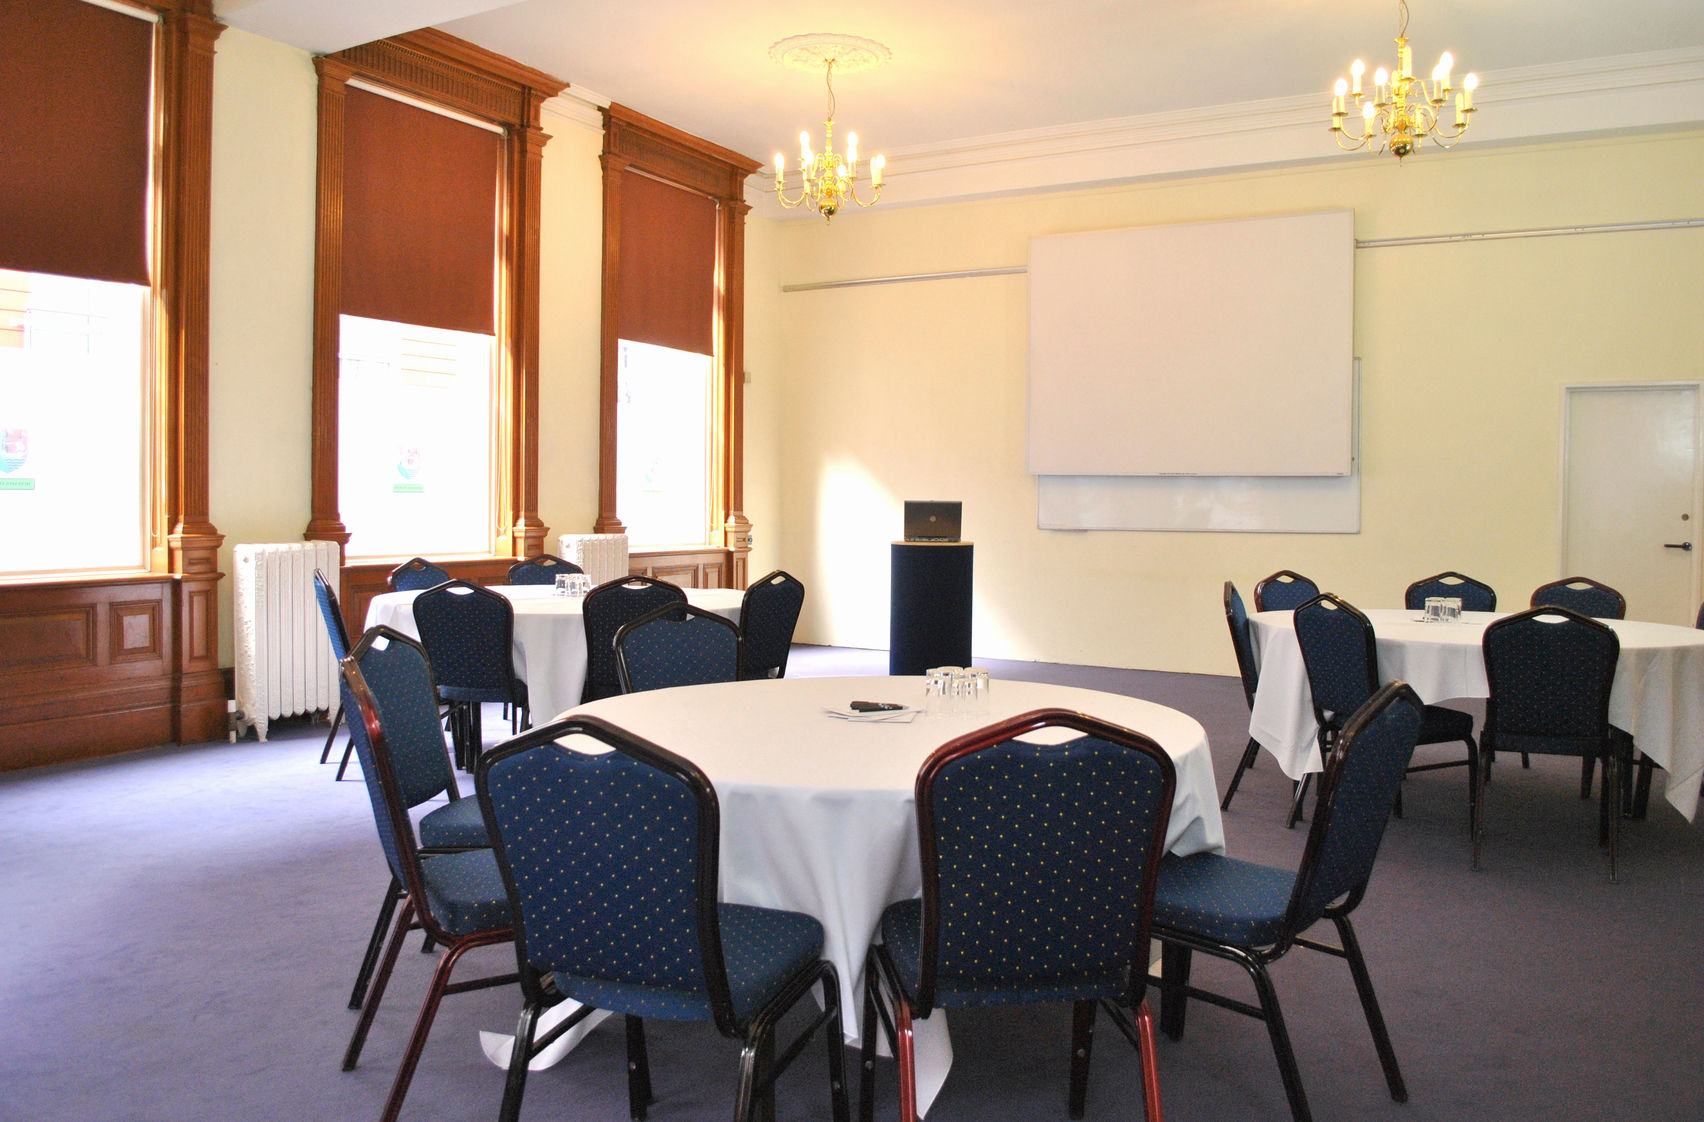 Brunel Room, Armada House